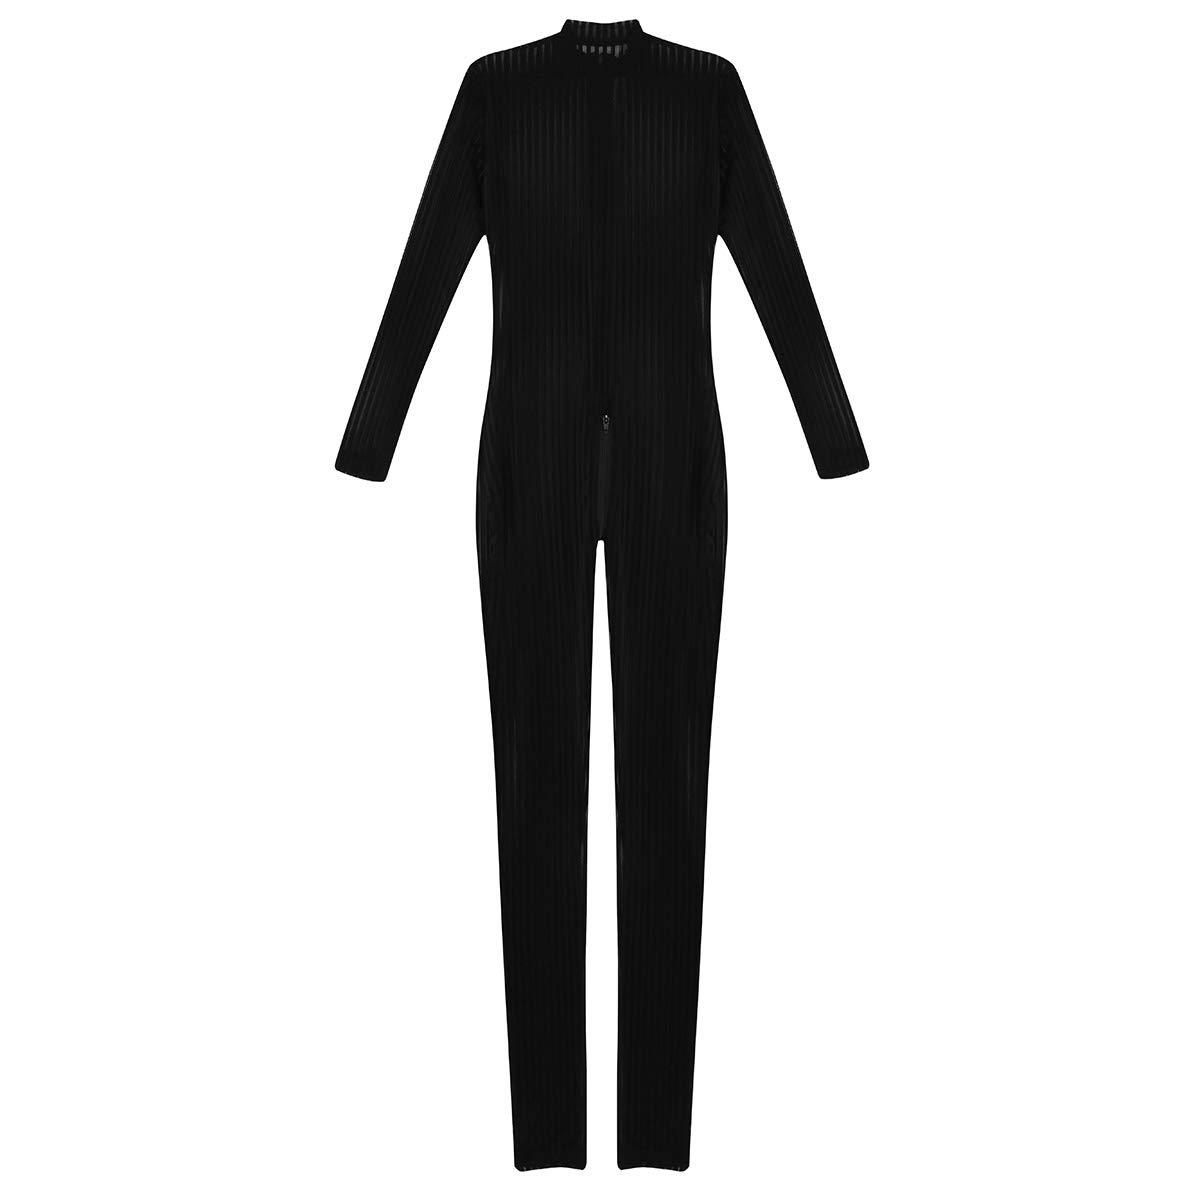 41e8d227ad69 Amazon.com  MSemis Women Black Sheer Full Bodysuit Lingerie Long Sleeve  Zipper Striped Mesh Bodystockings Jumpsuit Black One Size  Clothing